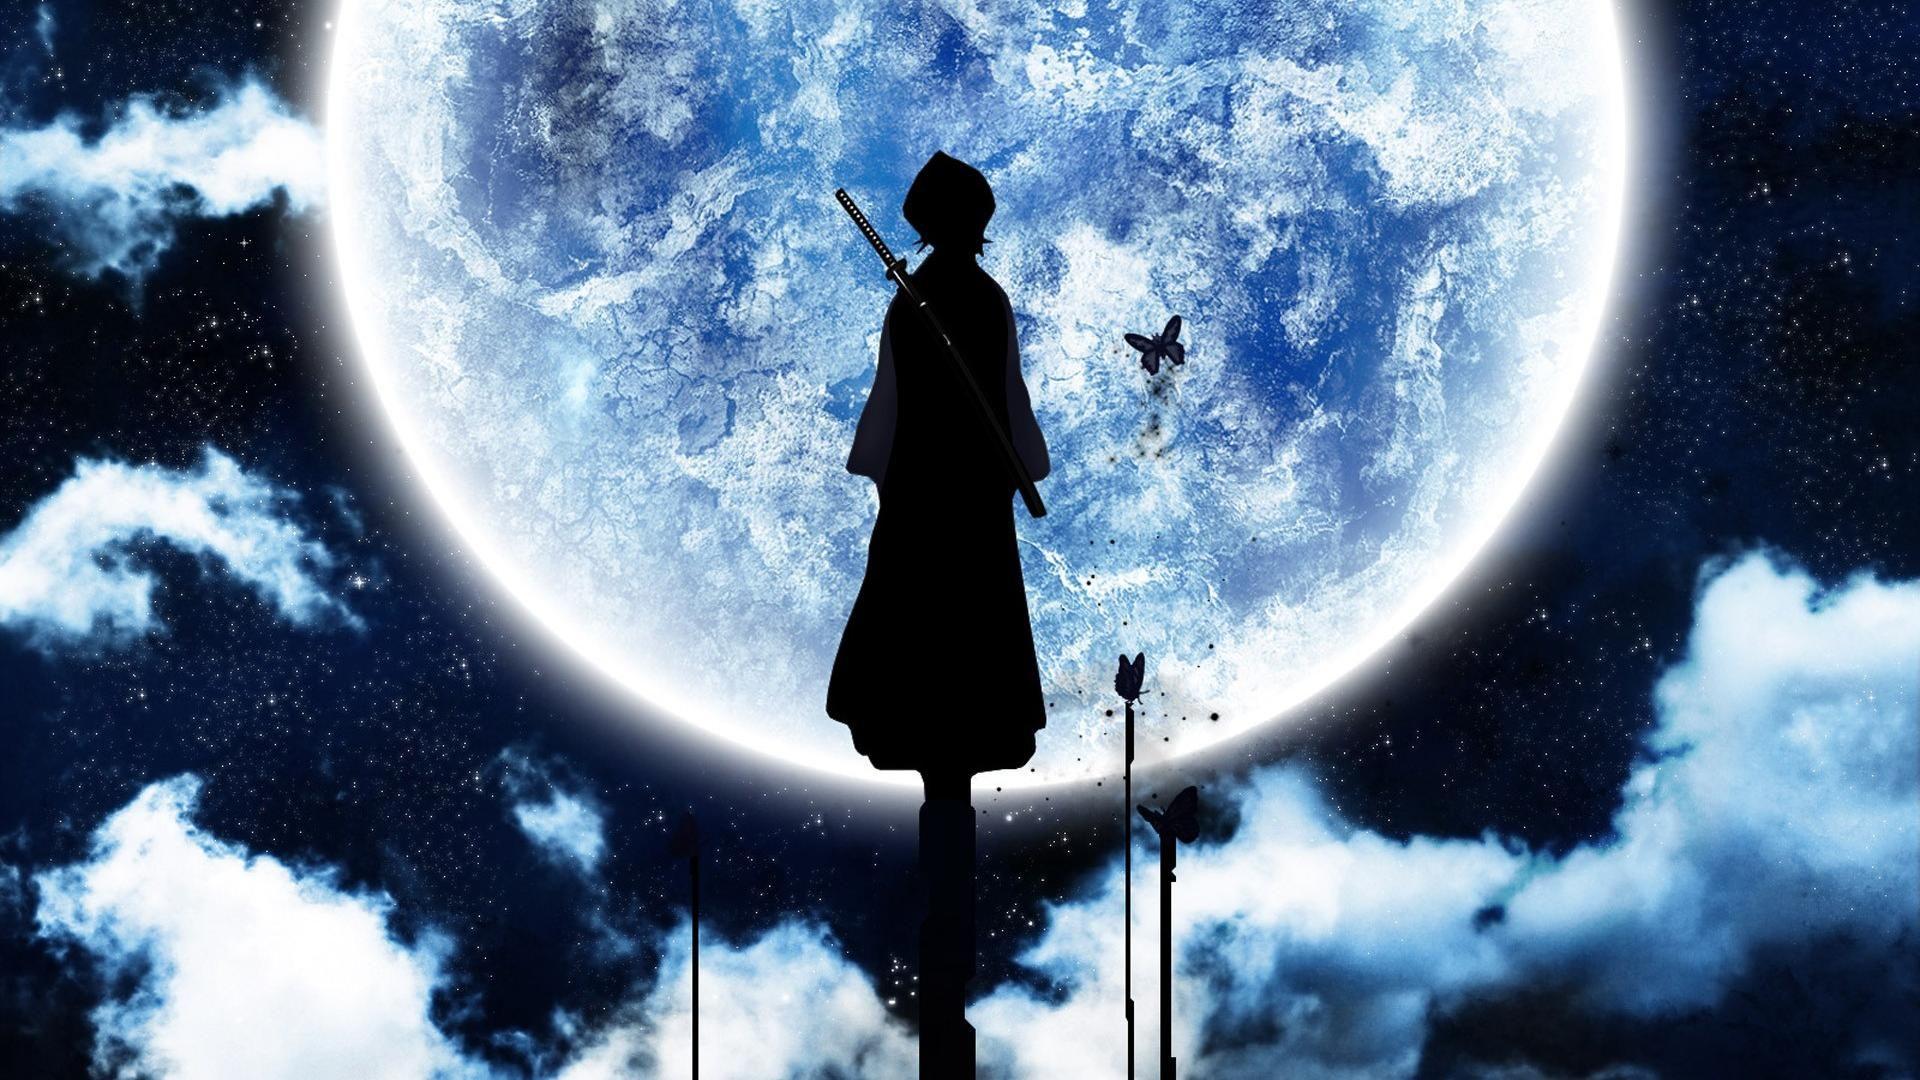 1080p Wallpapers Anime Hd Anime Wallpapers Anime Backgrounds Wallpapers Bleach Anime